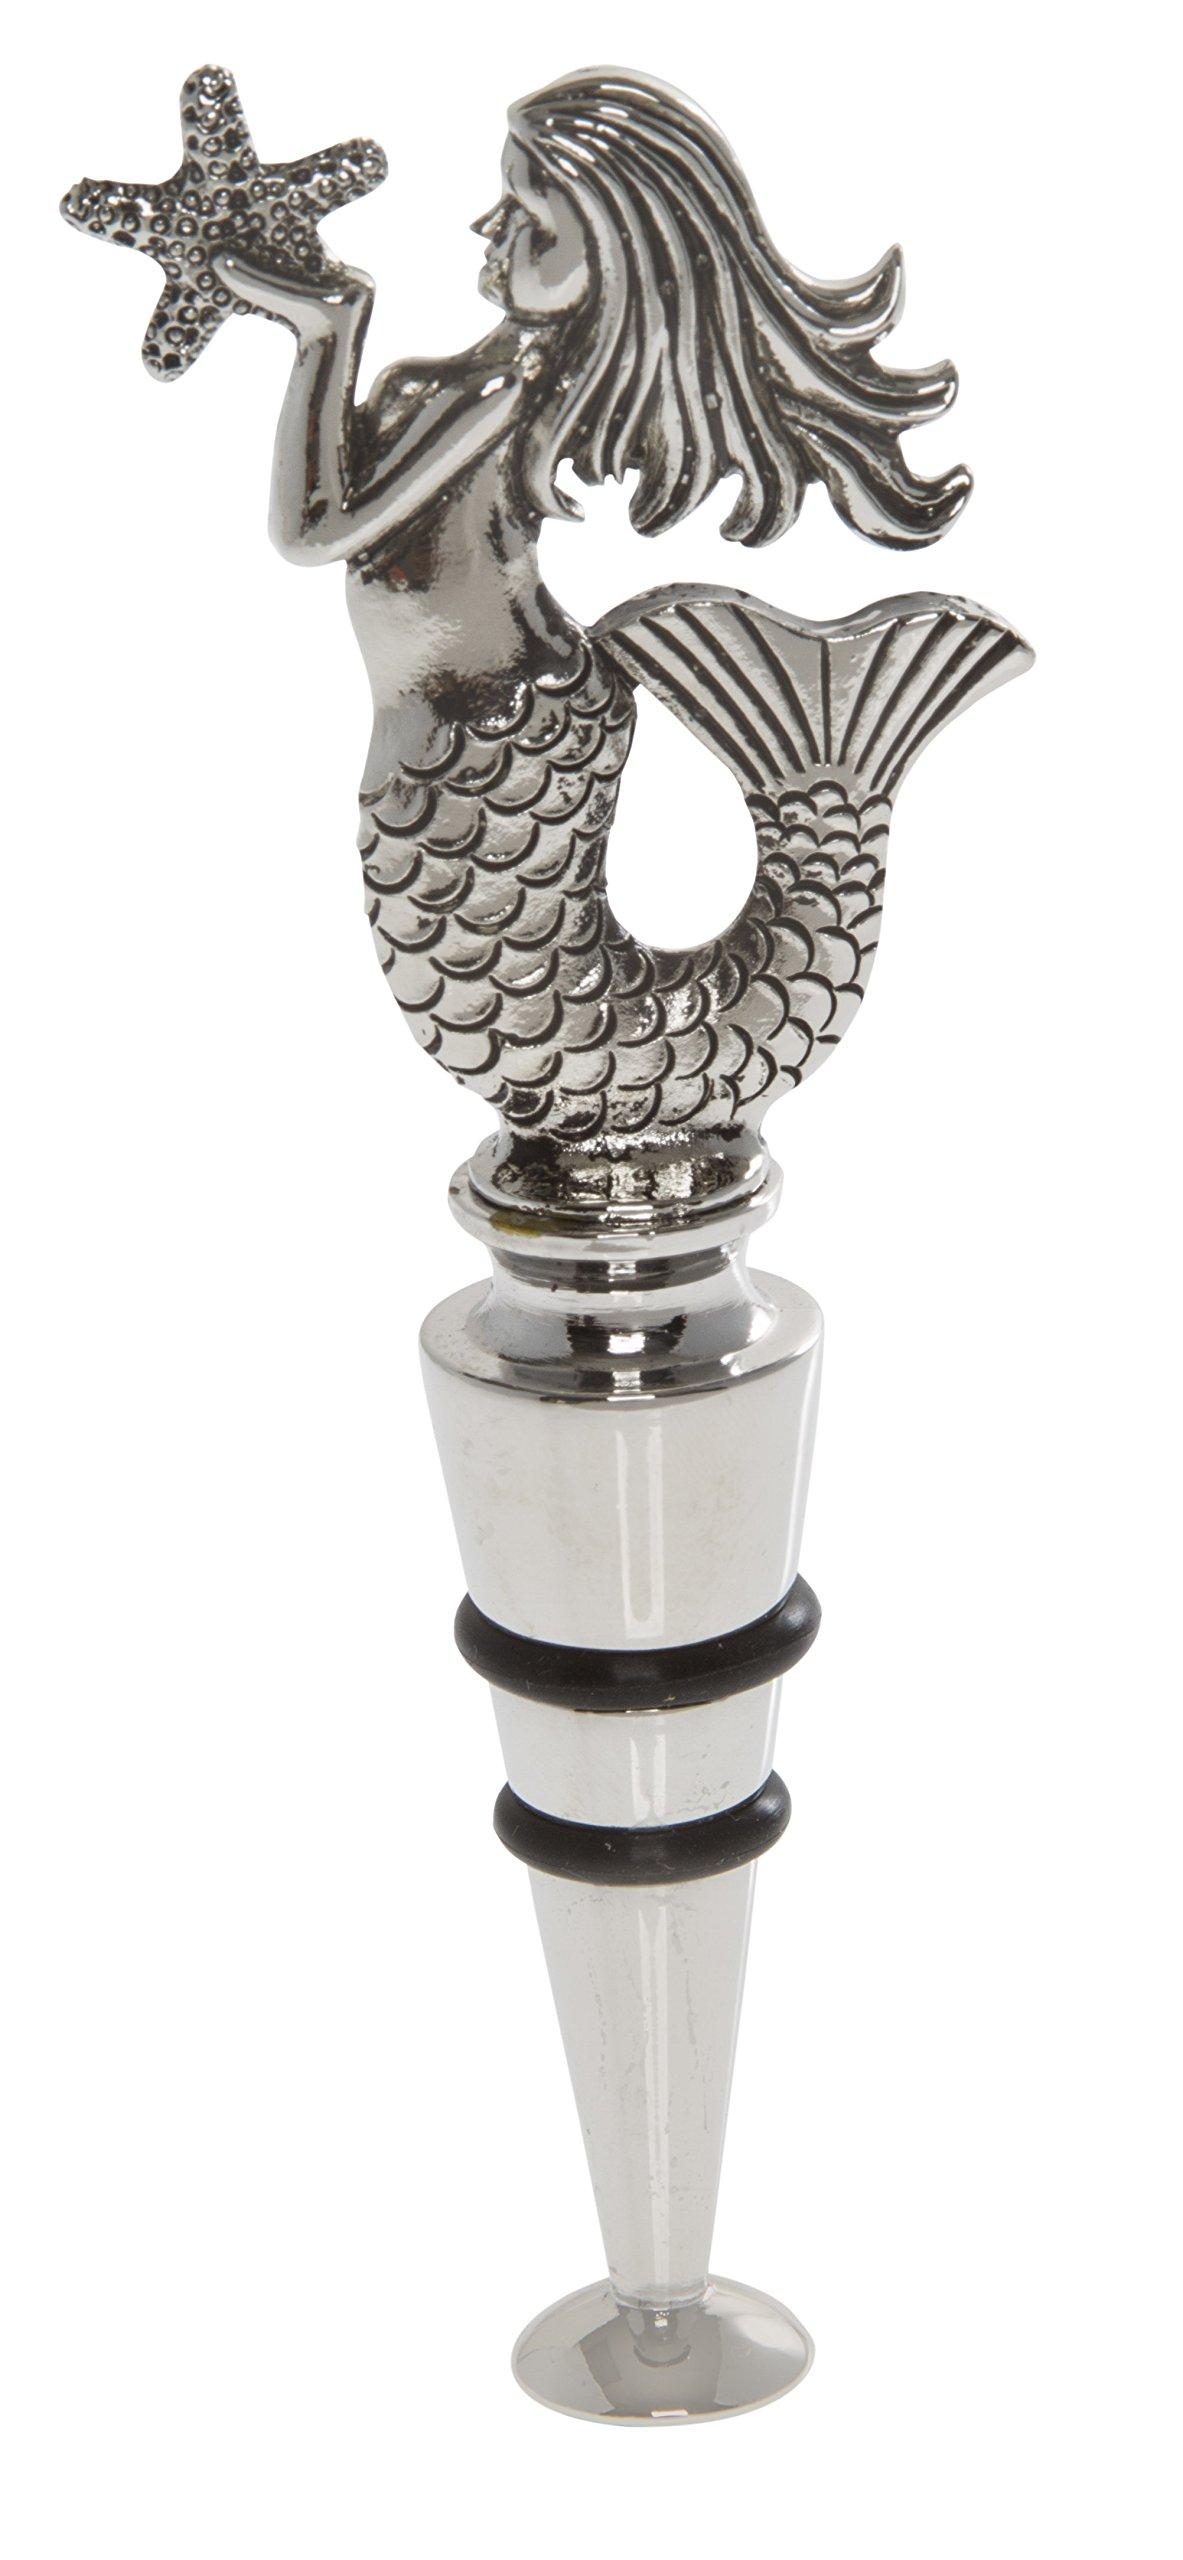 Thirstystone Mermaid Wine Stopper, Silver